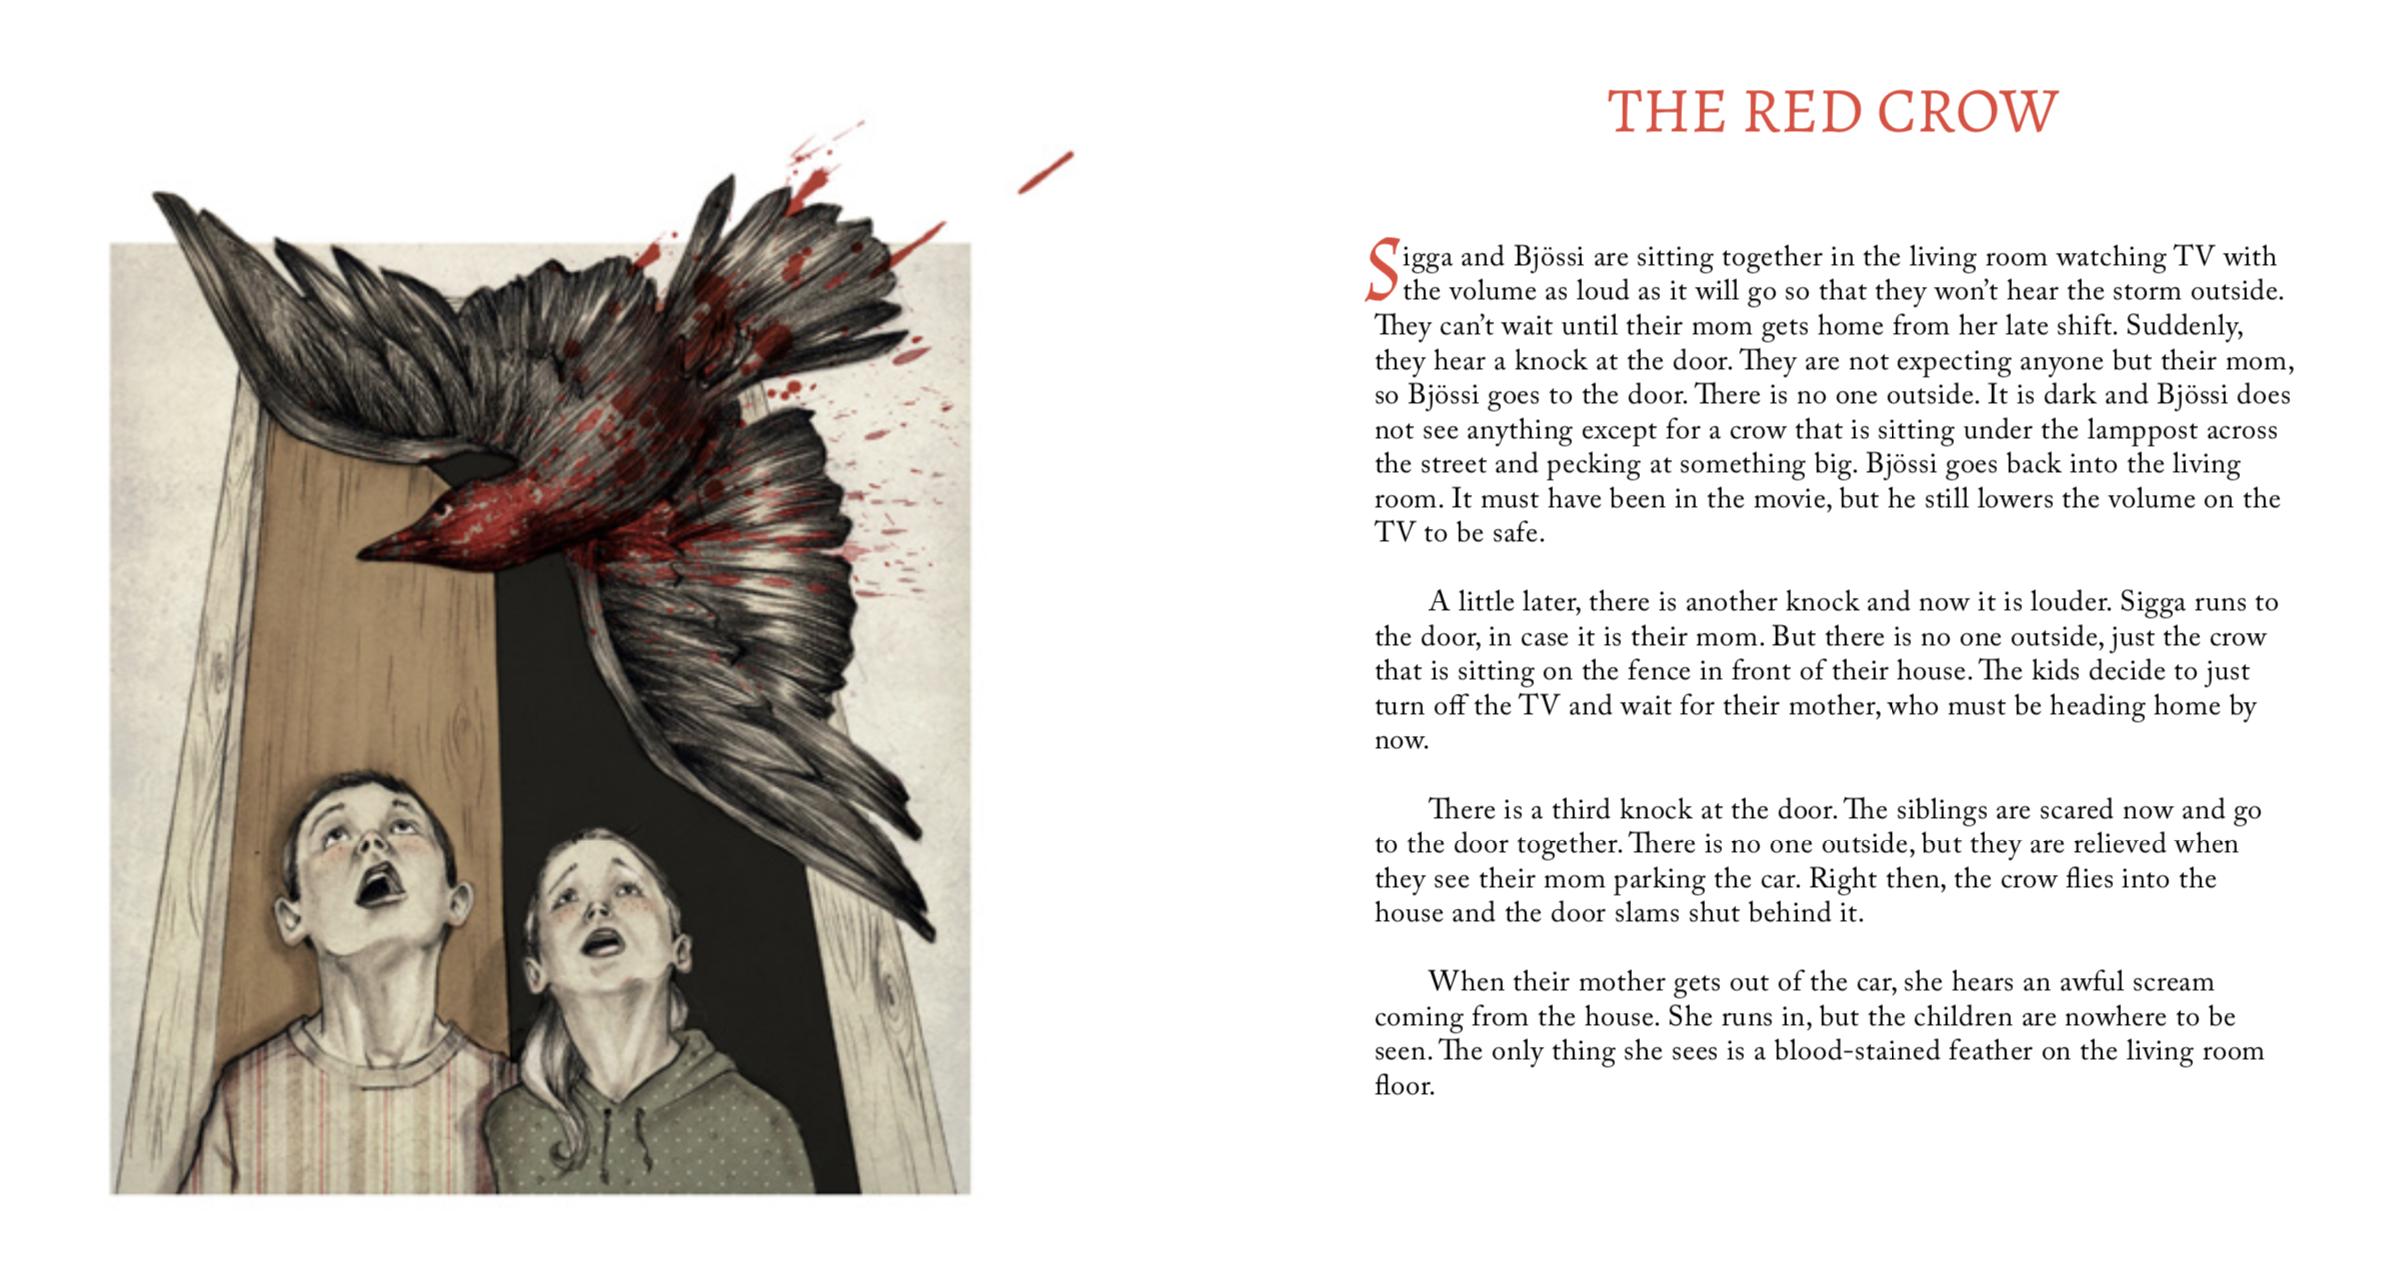 The Red Crow  by Freyja Gyðudóttir Gunnarsdóttir, age 9. Illustration by  Erla María .